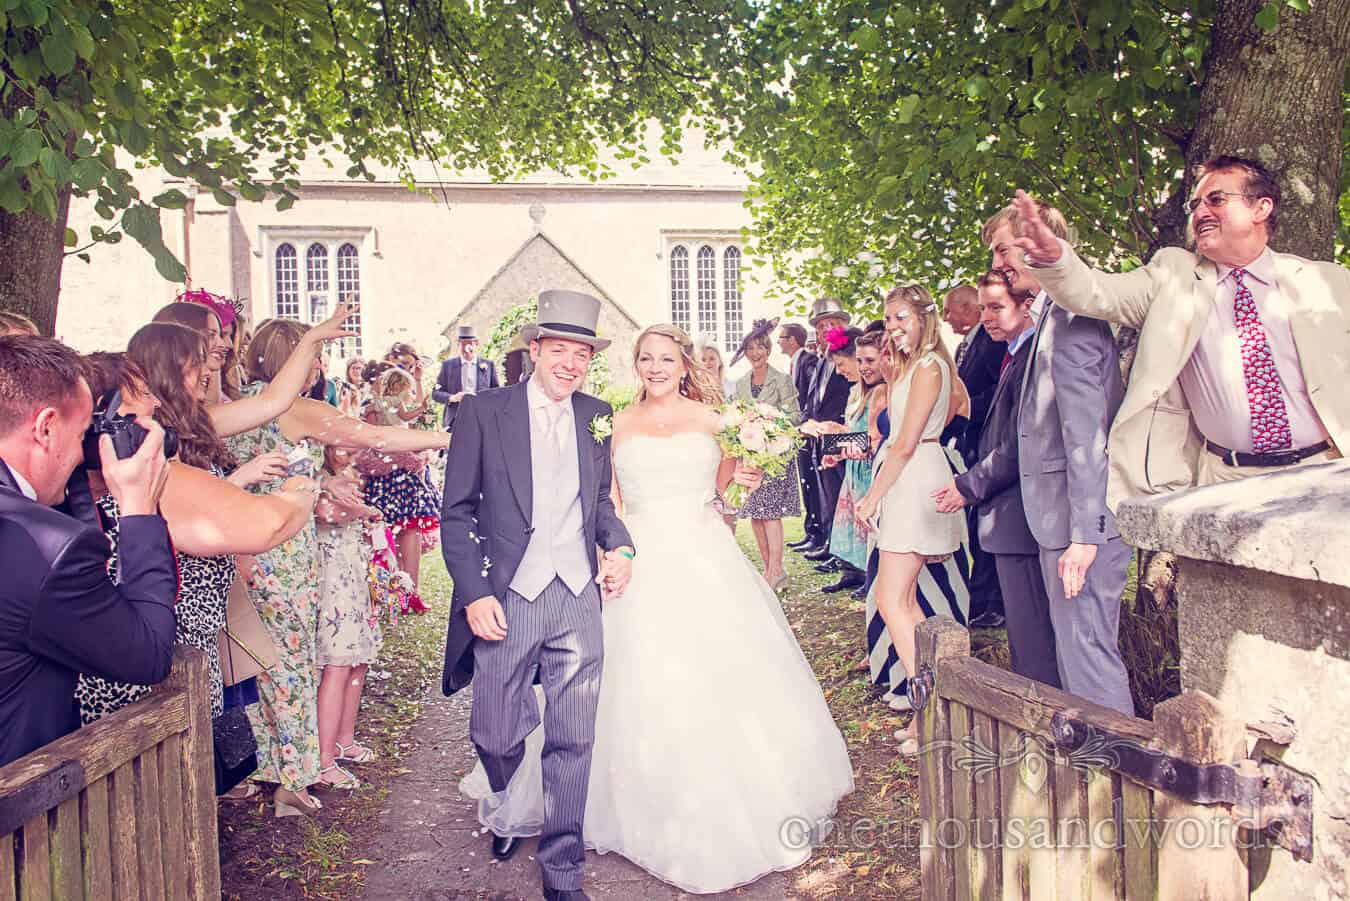 Wedding confetti at english country church wedding in Dorset